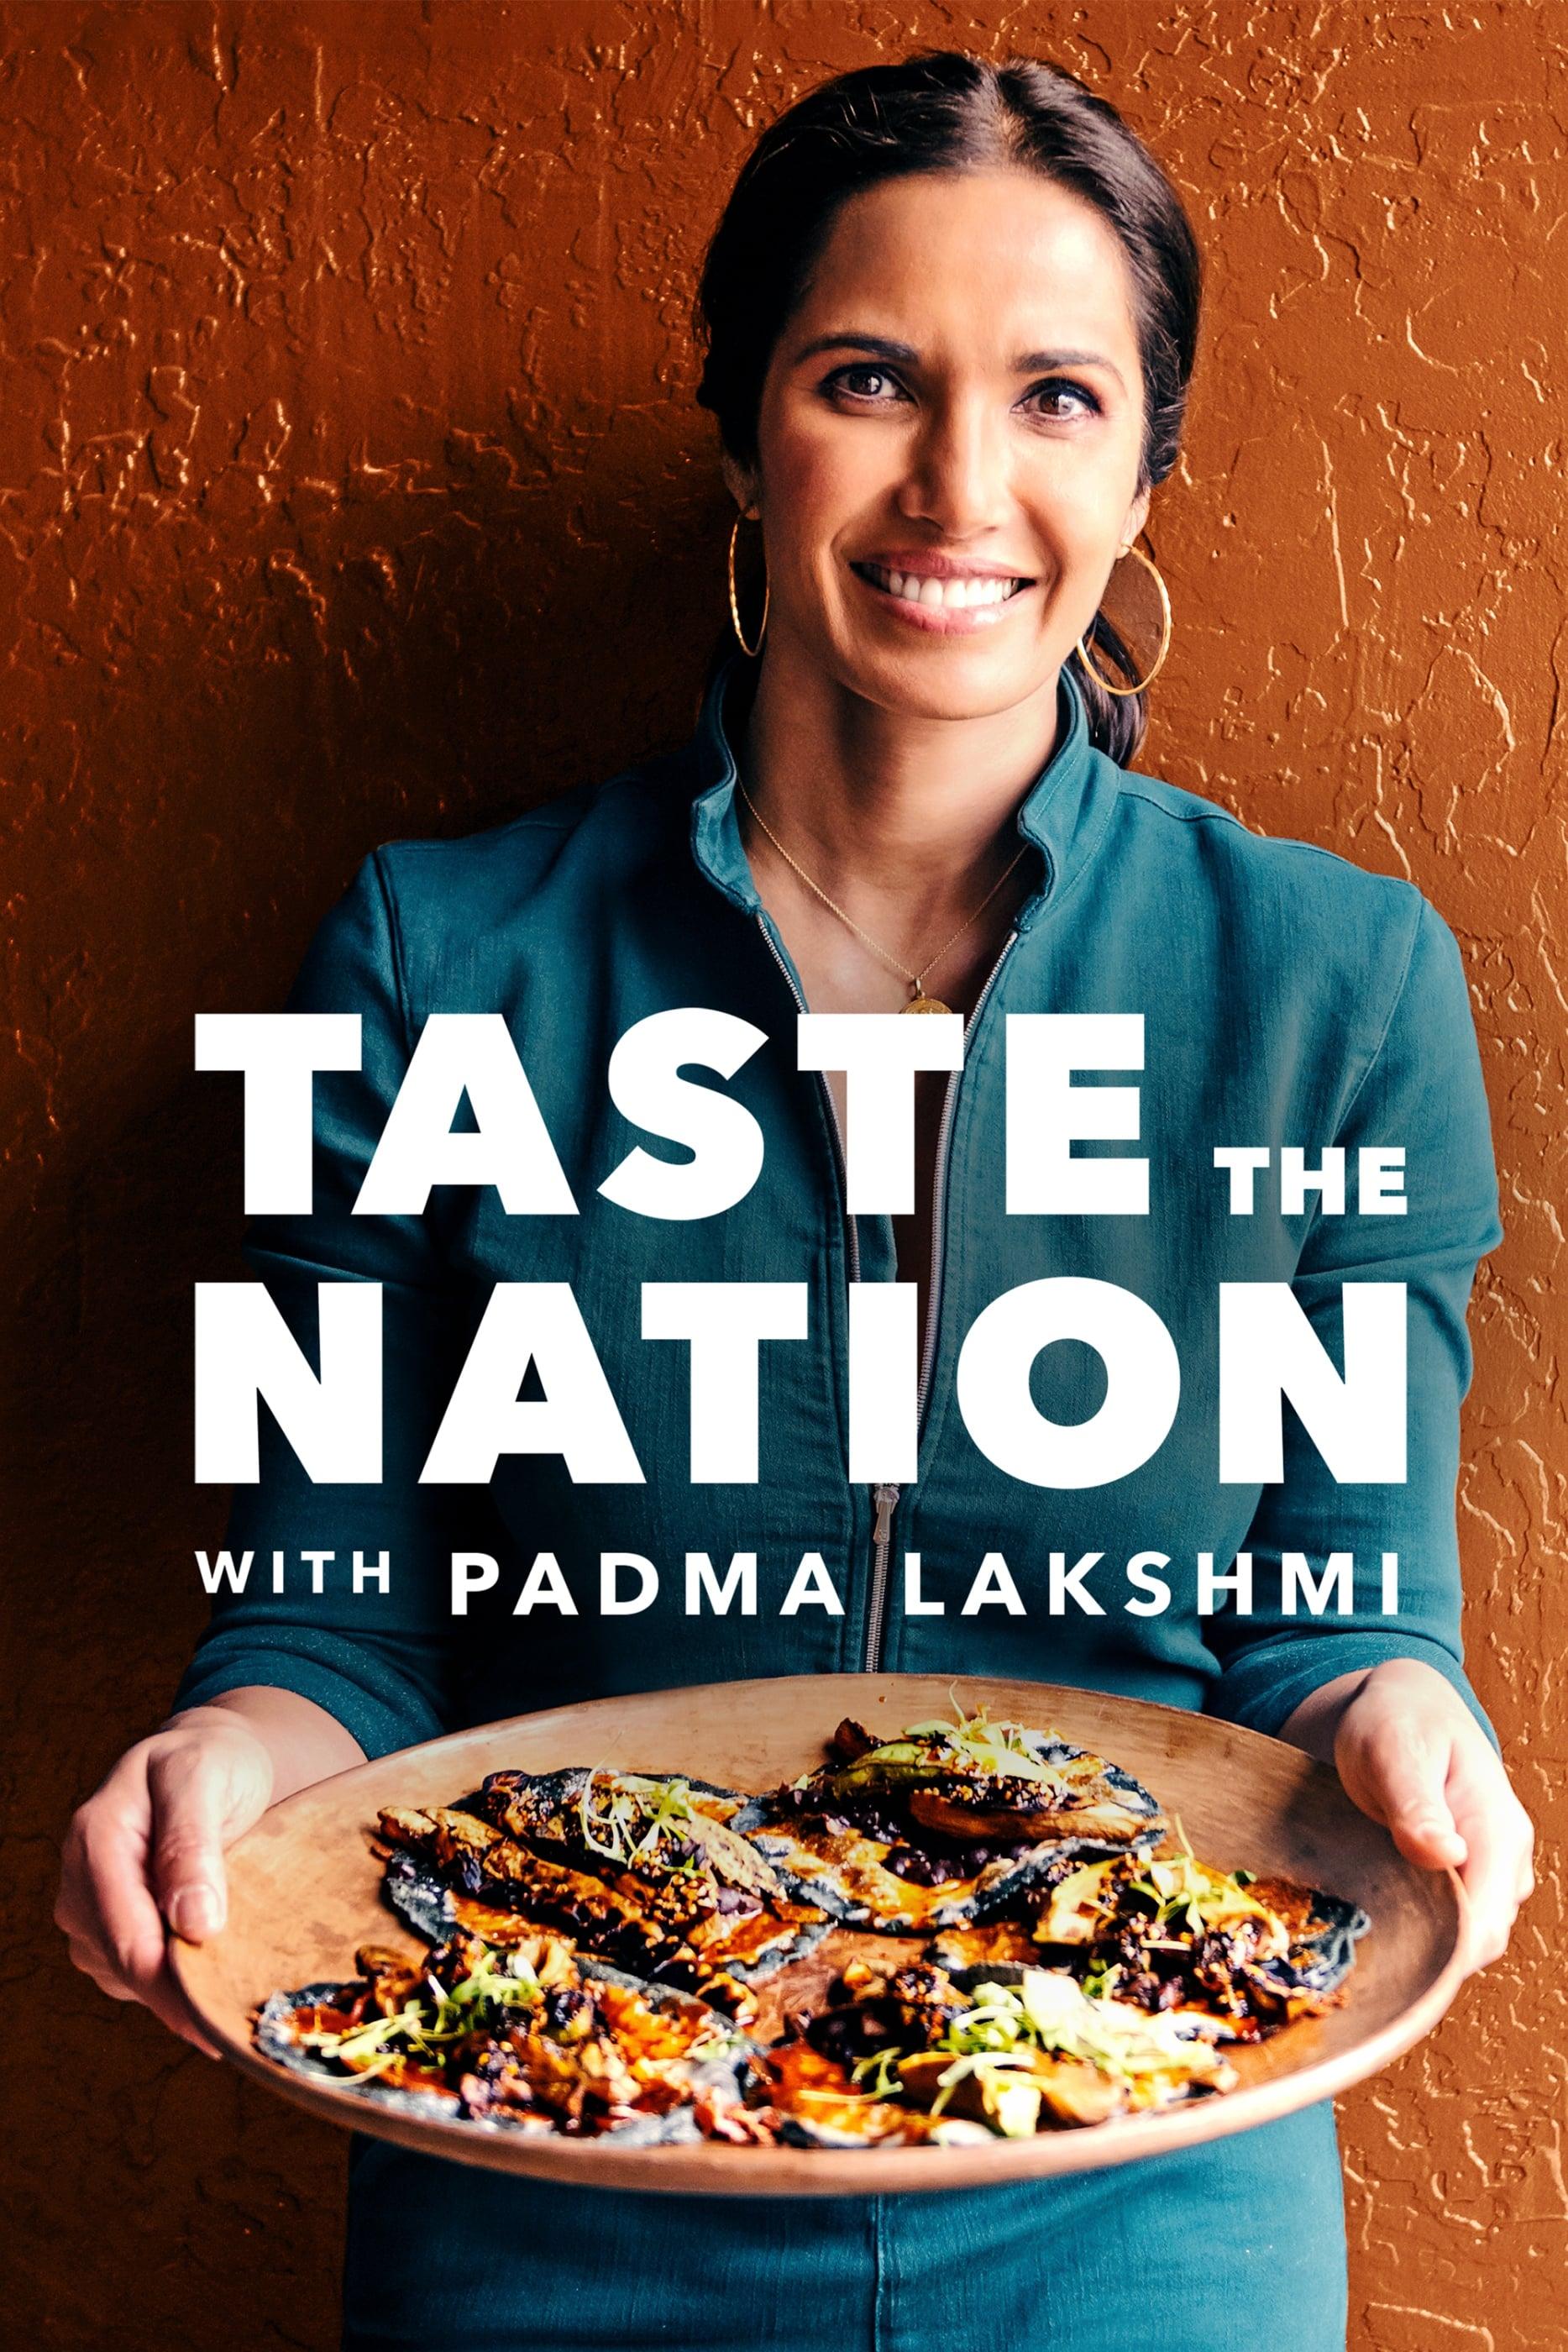 Taste the Nation with Padma Lakshmi